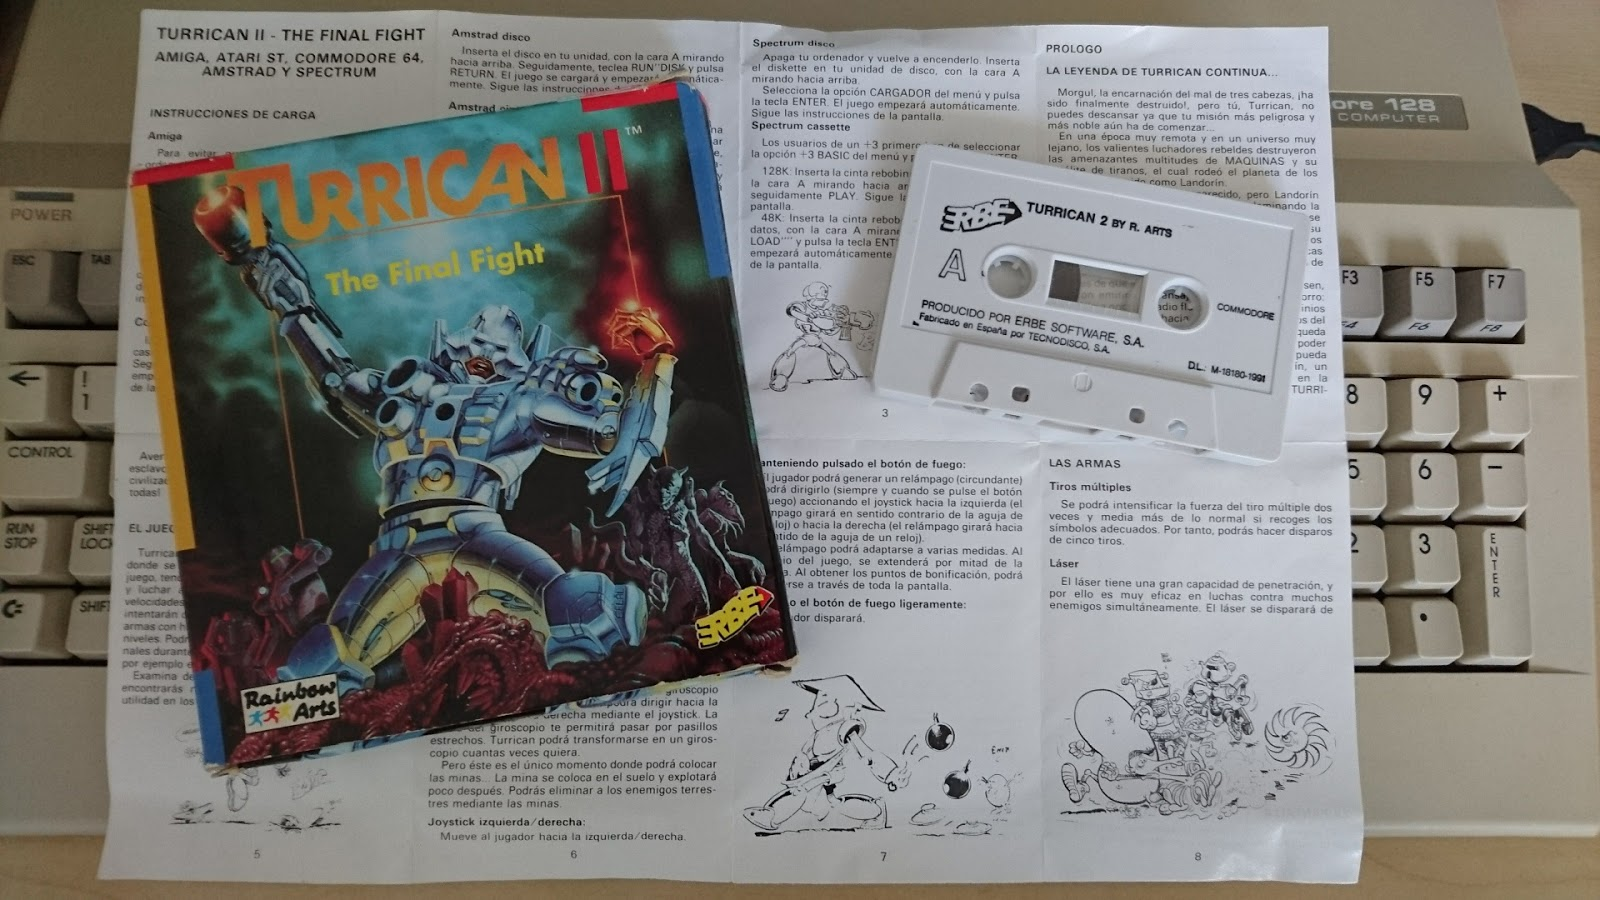 Turrican II - The Final Fight